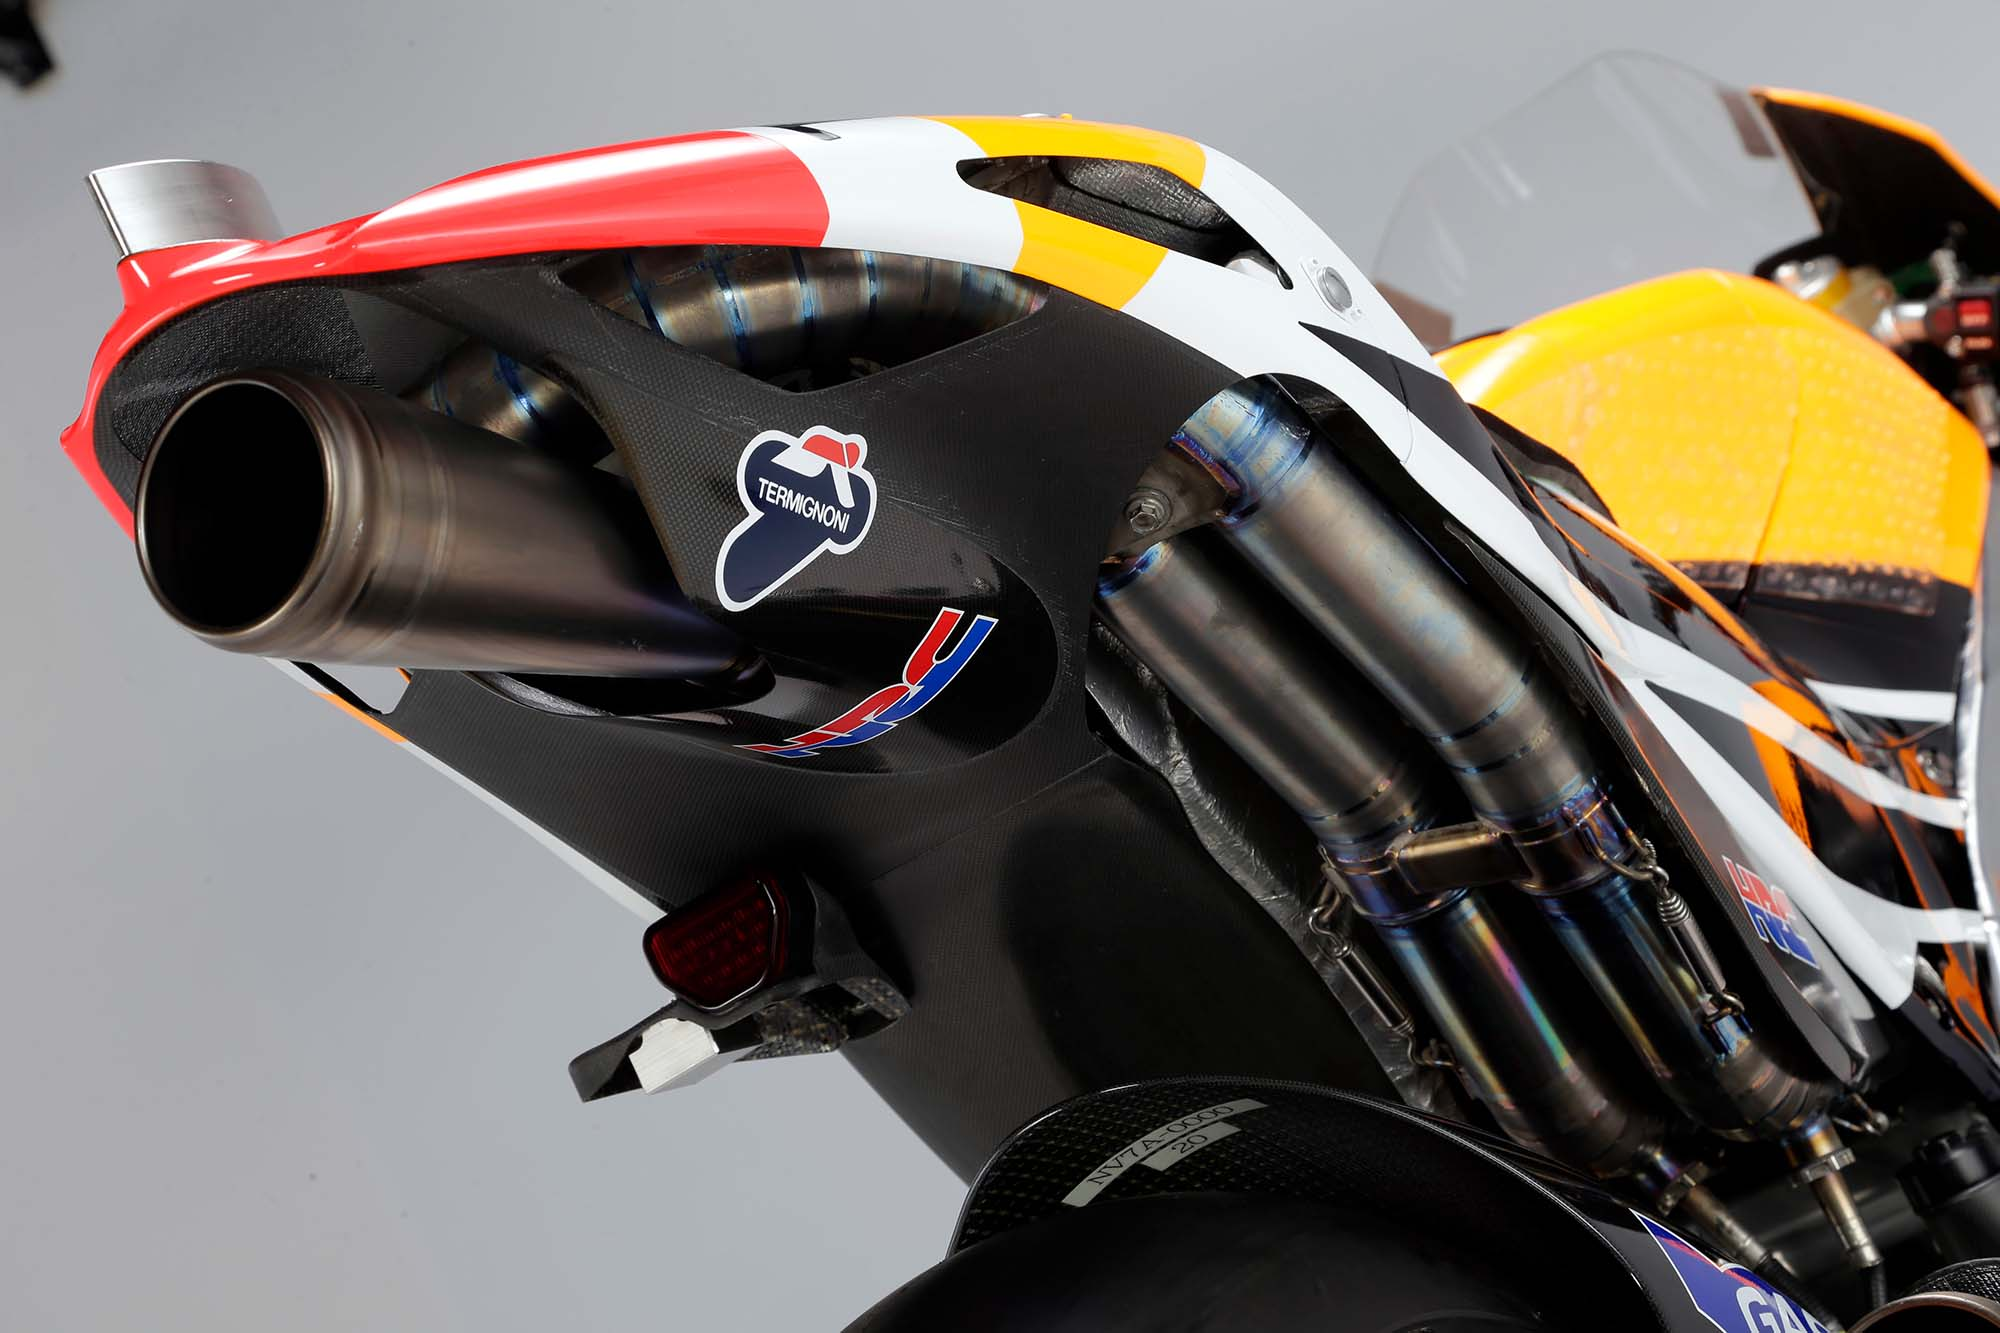 2013 Repsol Honda New Pics and Summary Spec Sheet - autoevolution